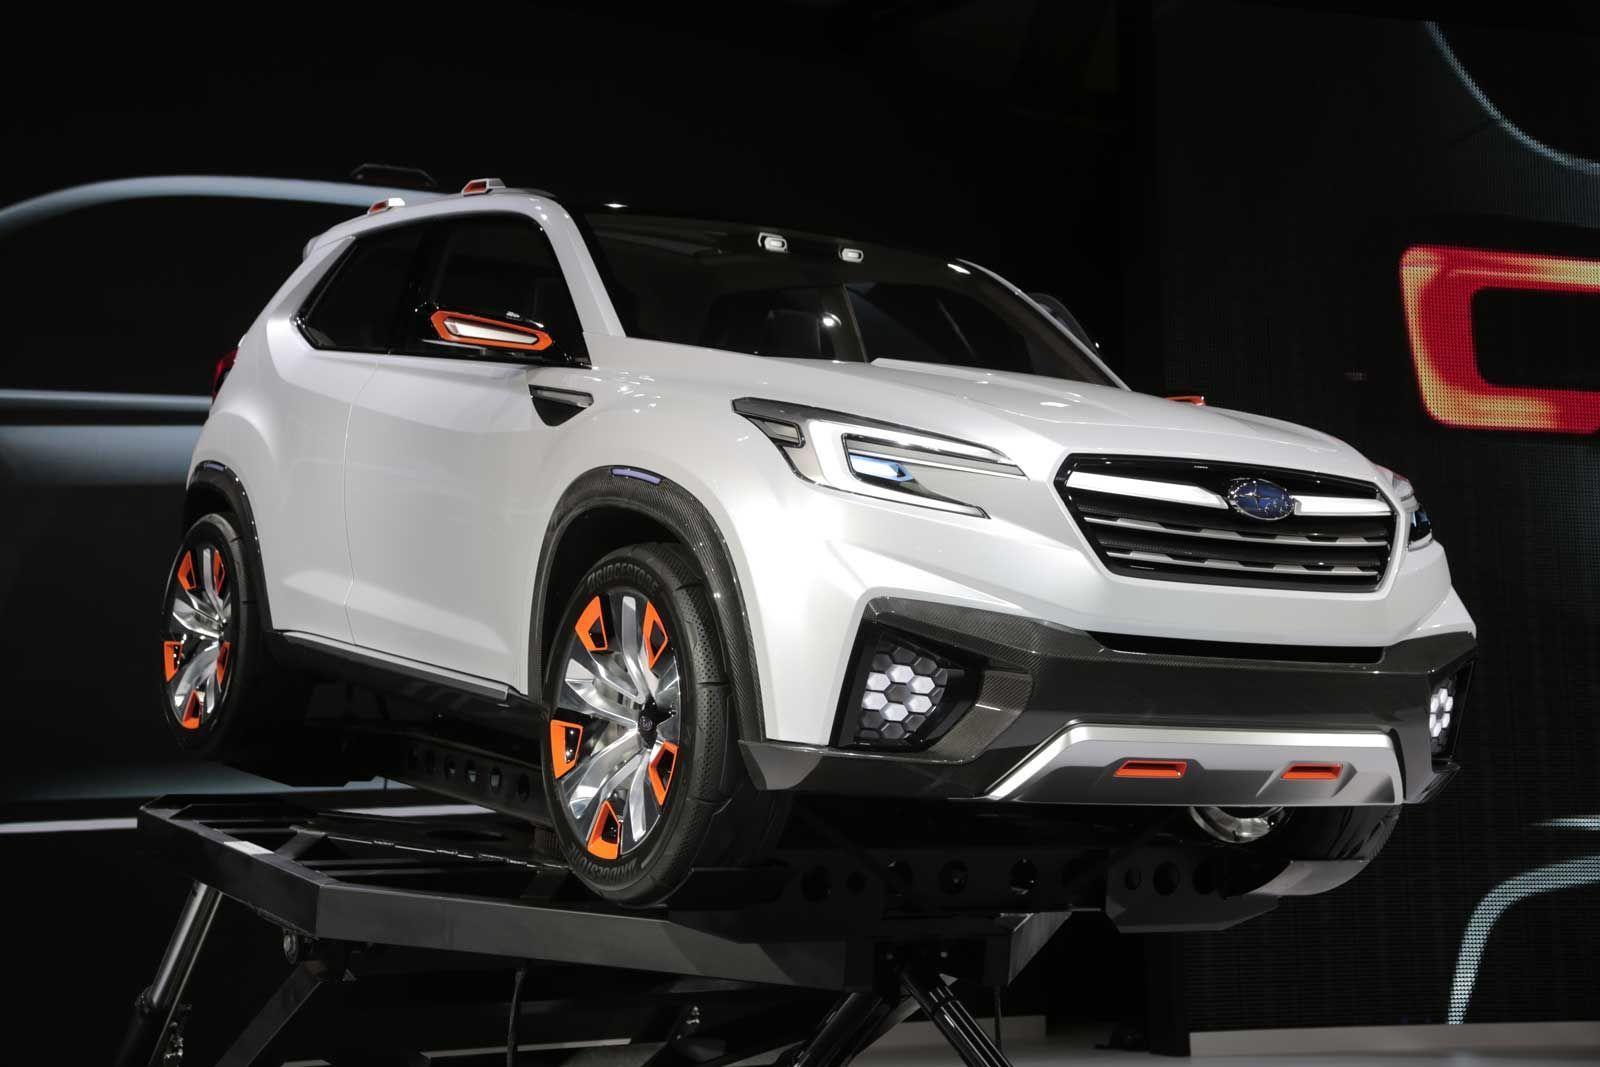 2020 Subaru Forester Sport Redesign and Concept Subaru